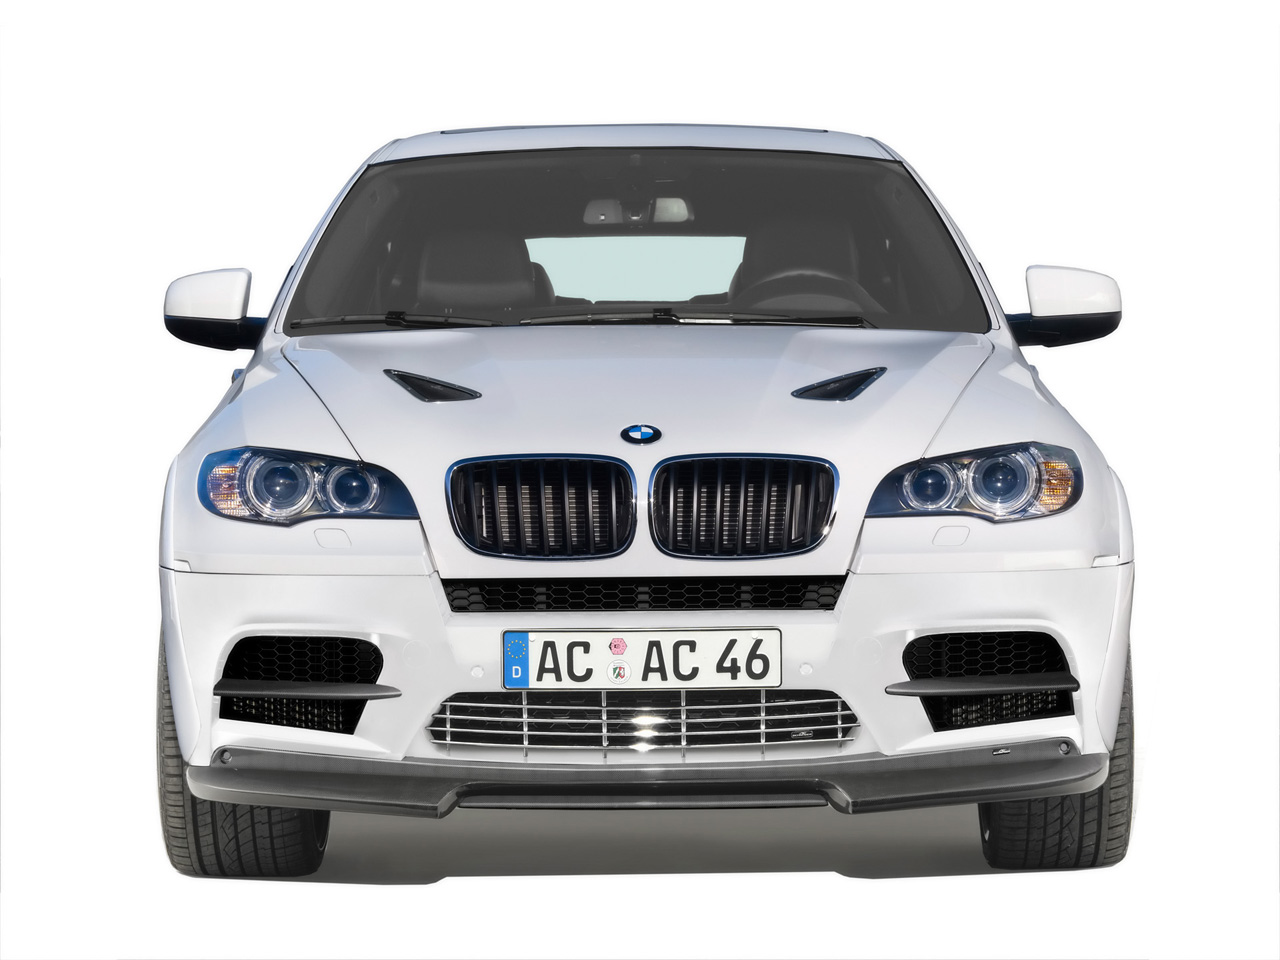 http://1.bp.blogspot.com/-WYlh8E73ZrE/ULICtY0IpPI/AAAAAAAADE0/UkxQp022t9A/s1600/2010+AC+Schnitzer+BMW+X6M+Falcon+4.jpg